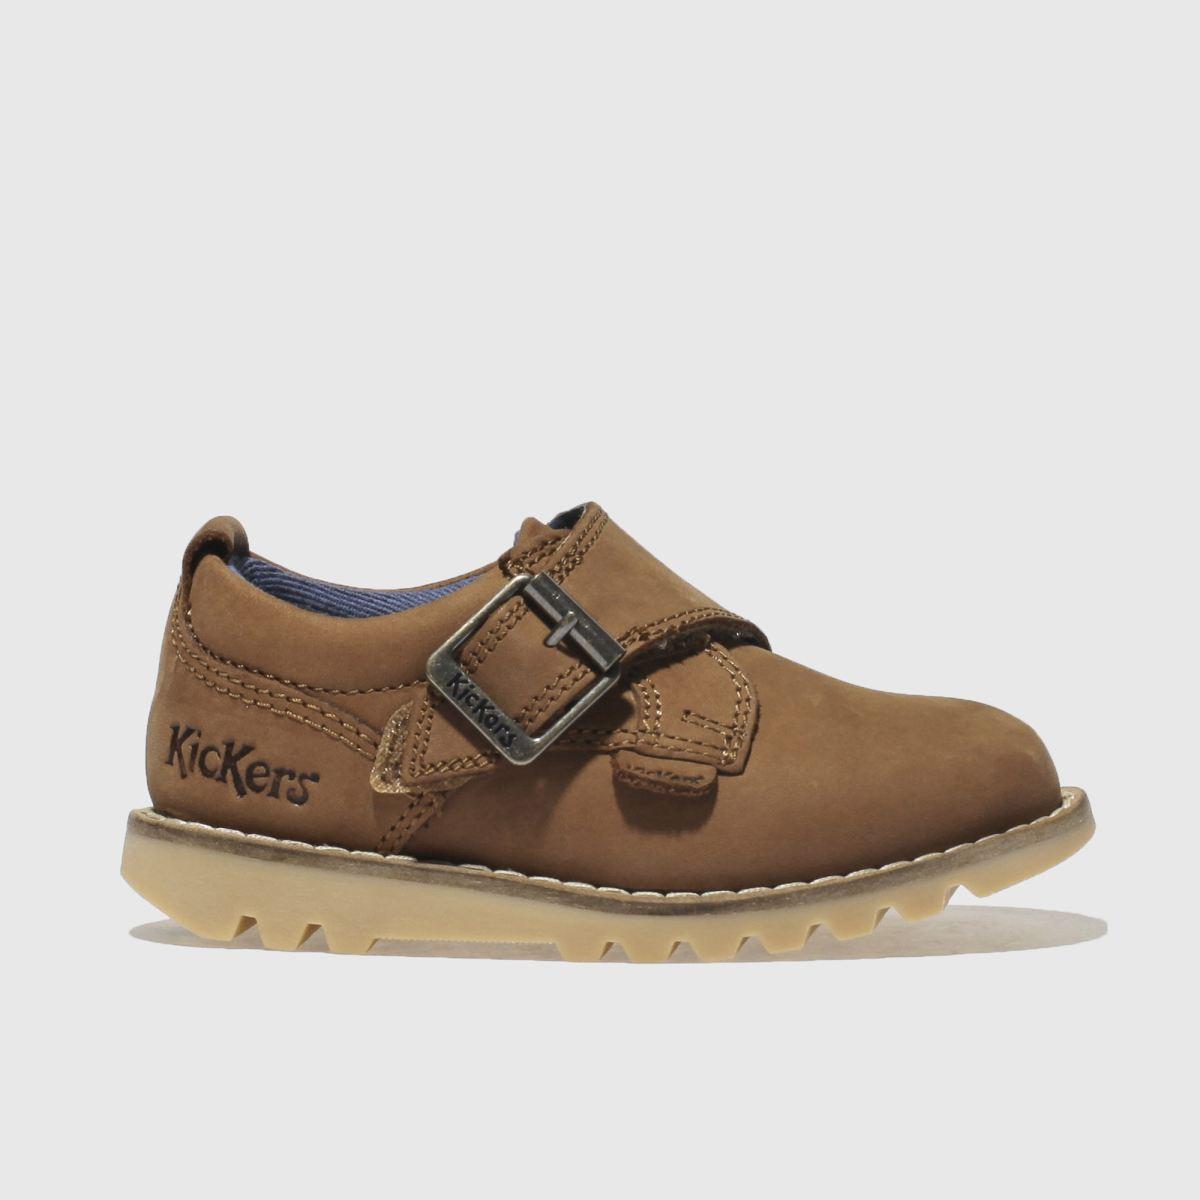 Kickers Tan Kymbo Monk Strap Boots Toddler